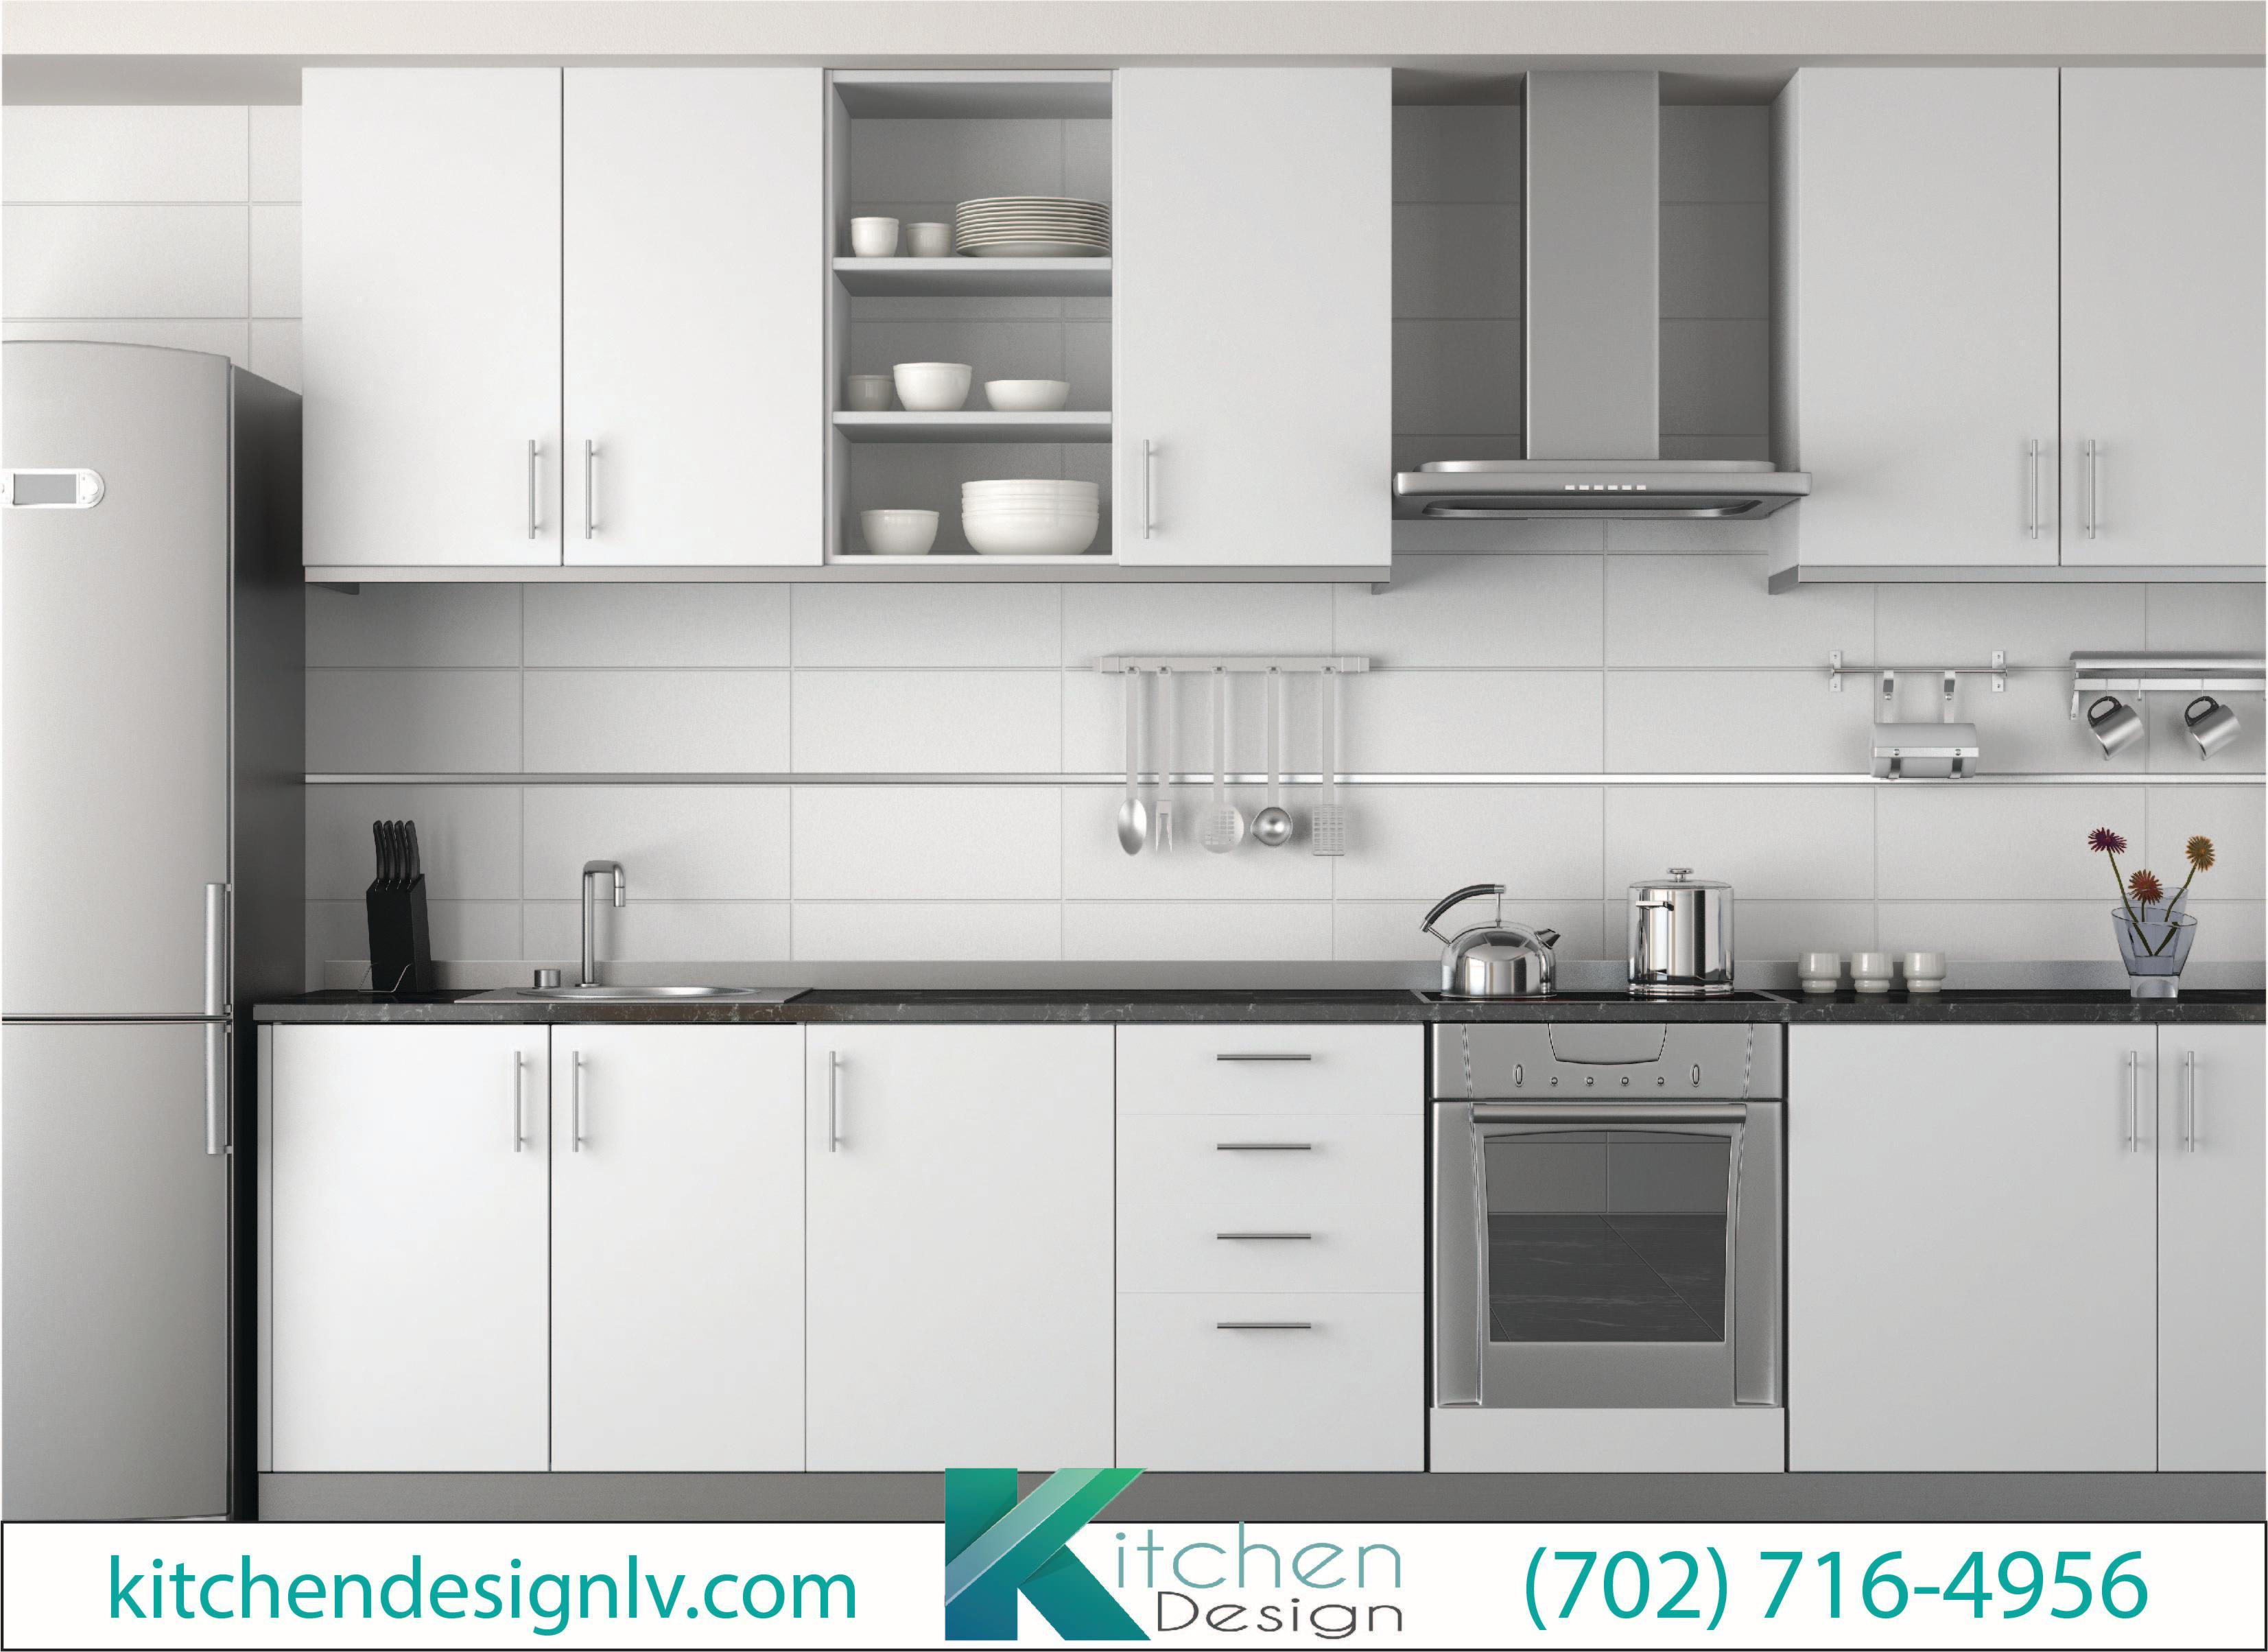 Kitchen design llc in las vegas nv 89102 for Kitchen design las vegas